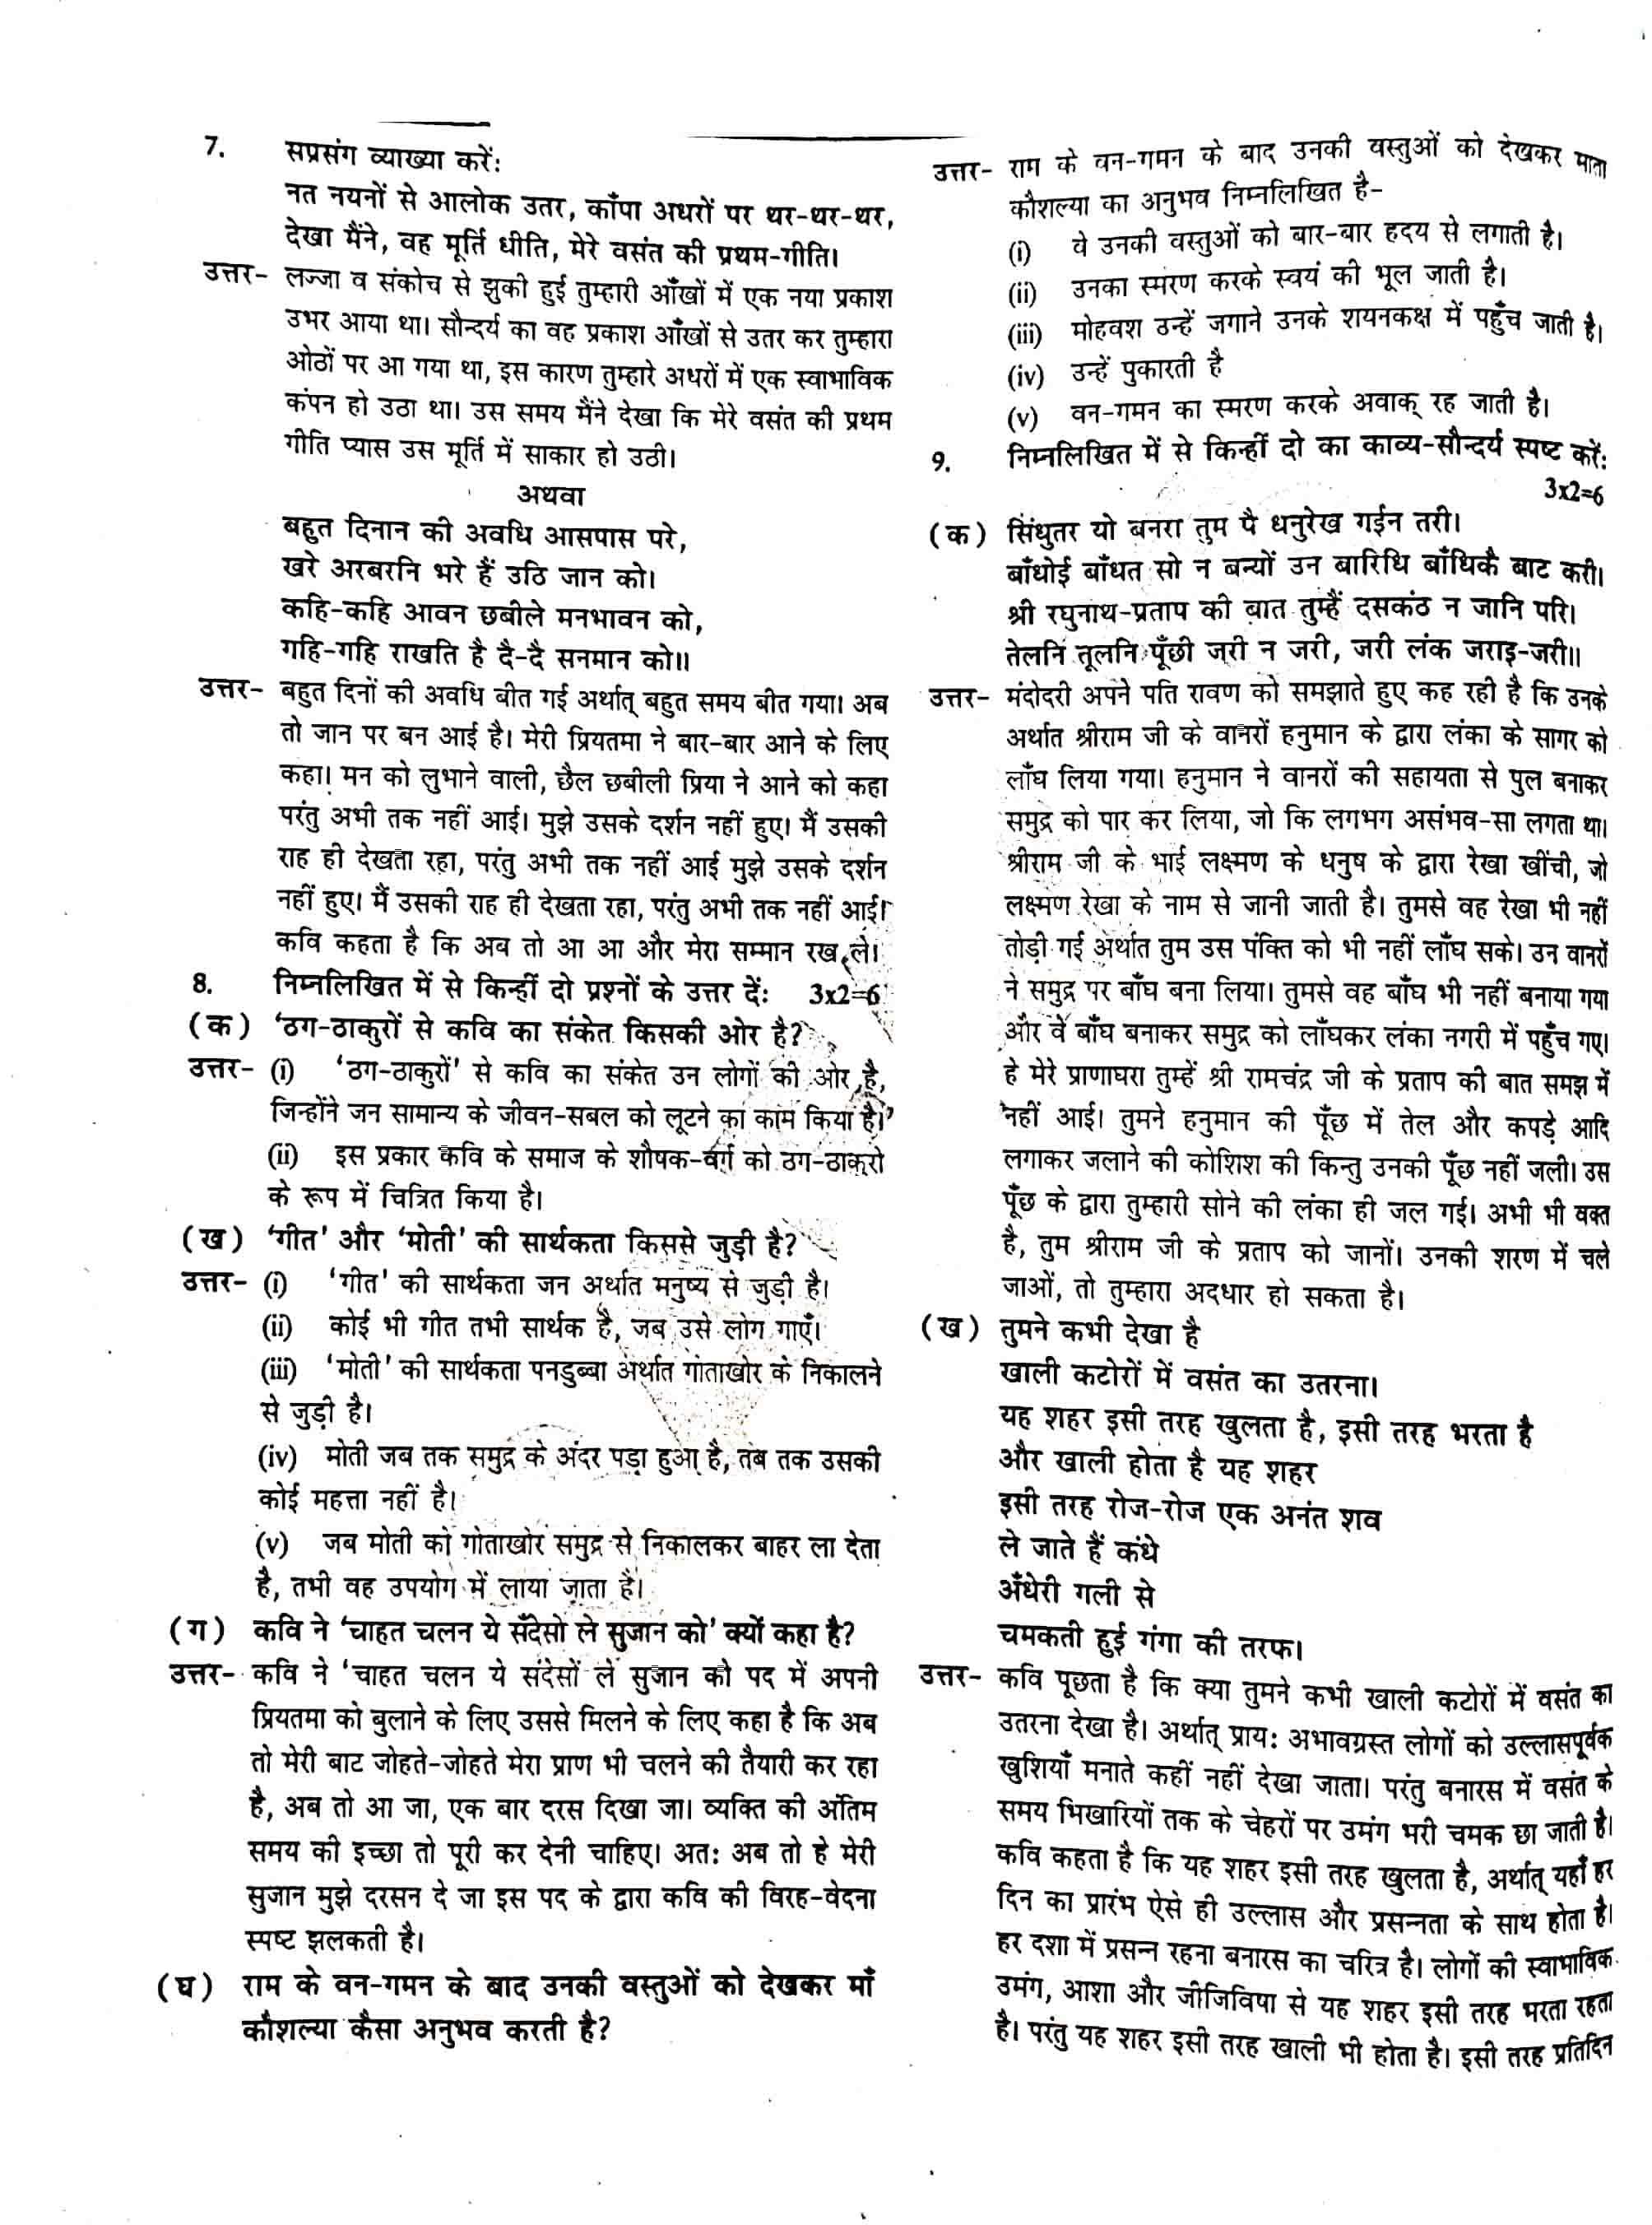 JAC Class 12 hindi 2020 Question Paper 02